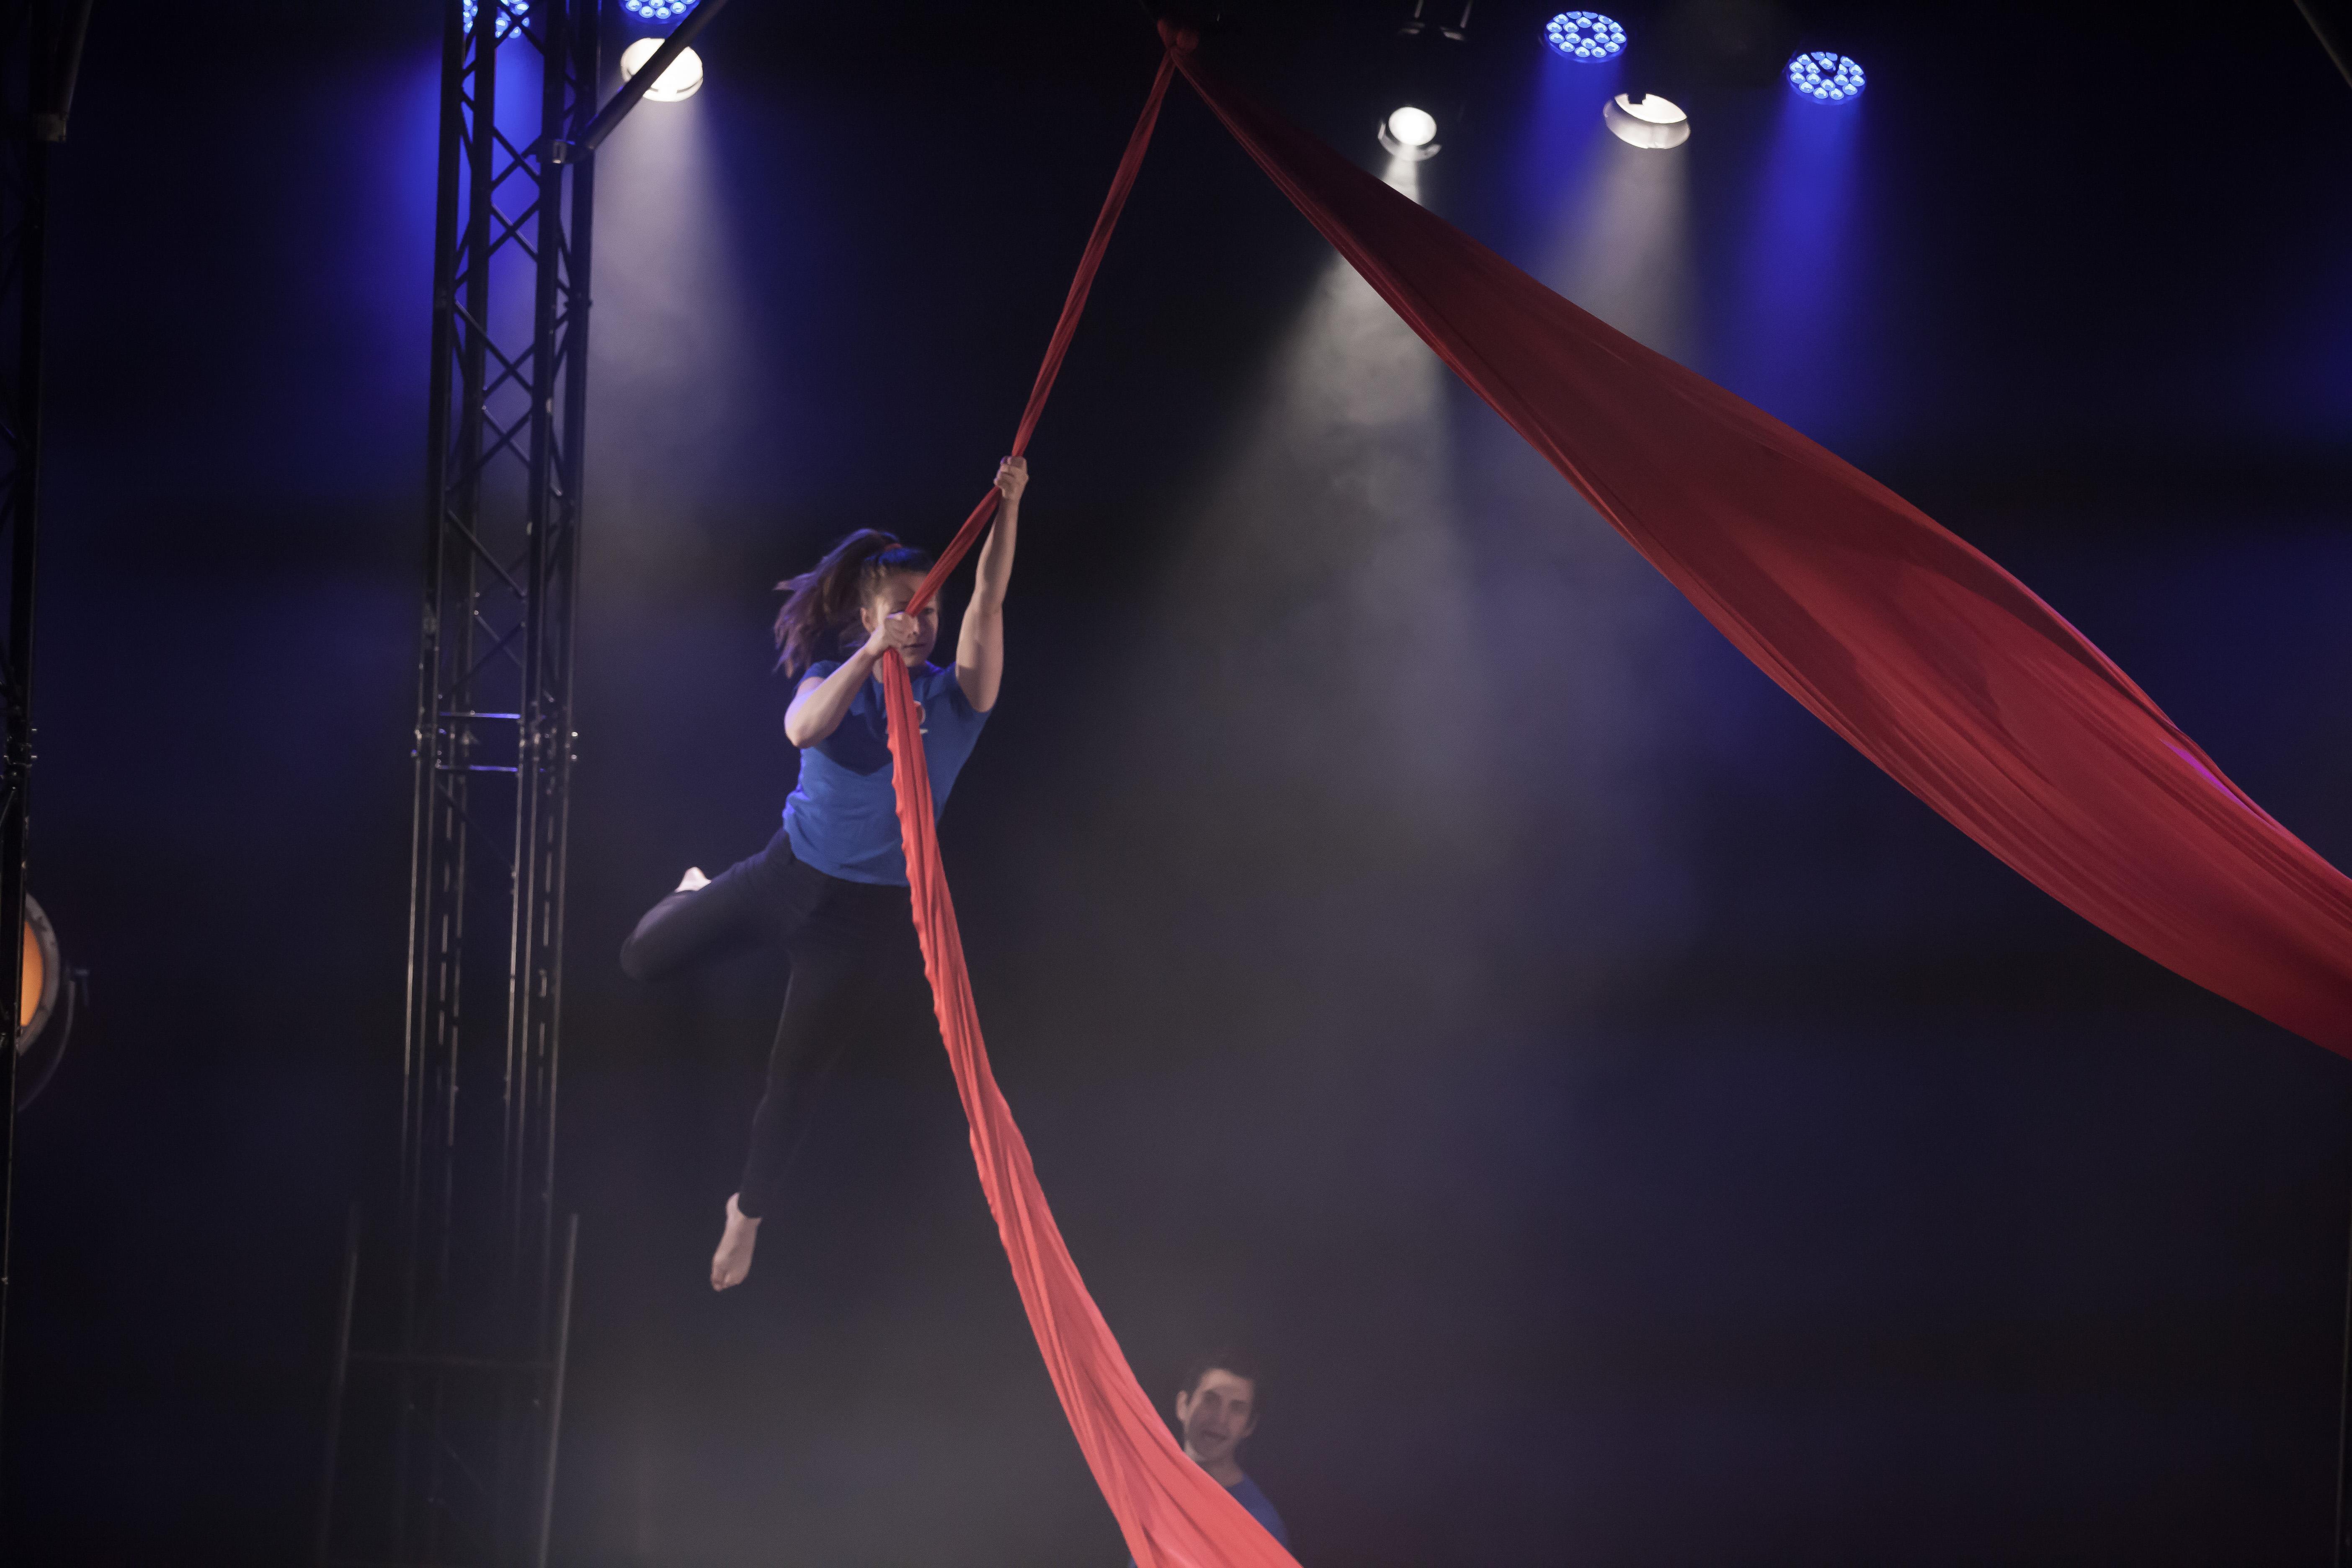 170701-battle-cirque-jdufresne-37_35793770266_o